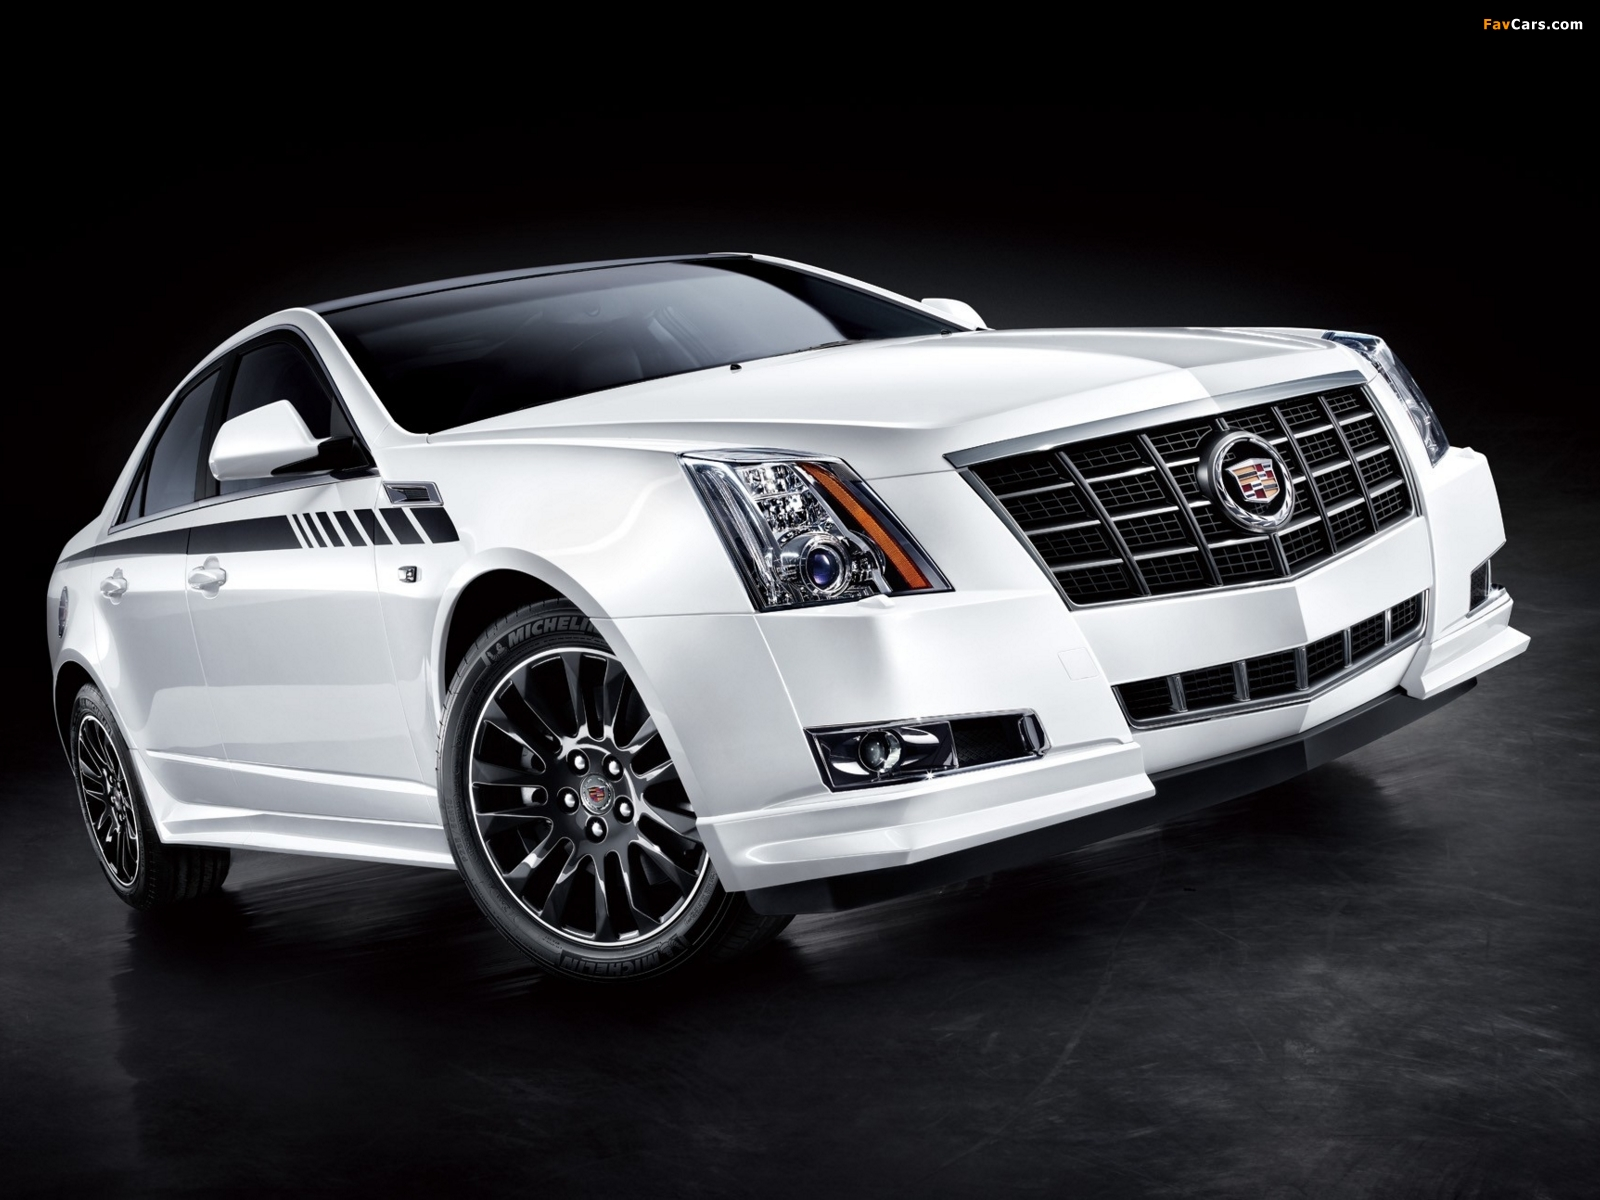 Cadillac CTS Vday 2013 images (1600 x 1200)